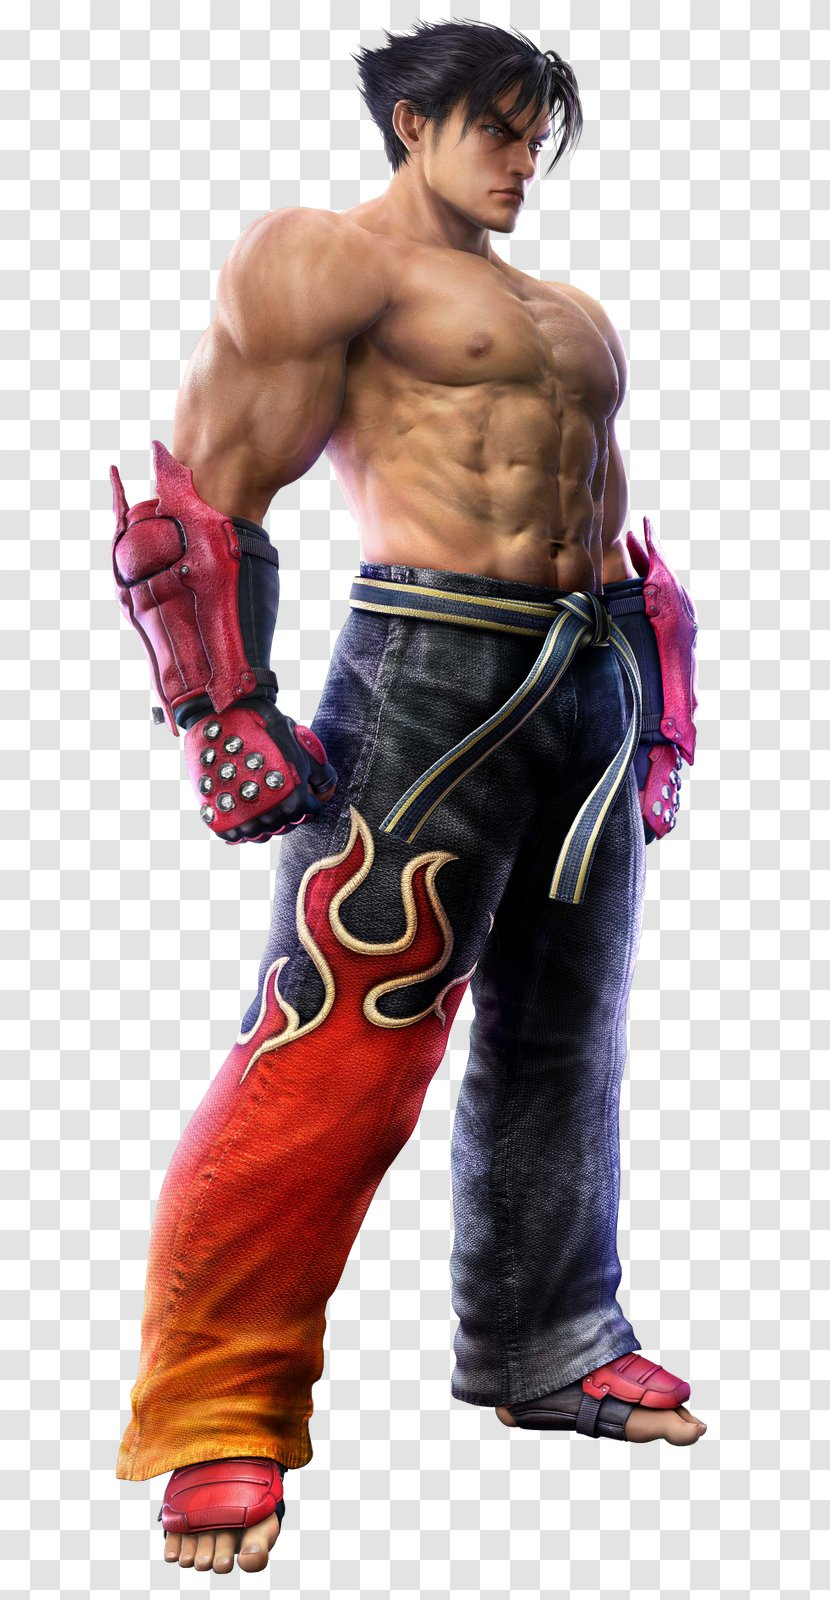 Tekken 6 Jin Kazama Kazuya Mishima 3 Barechestedness Krrish Transparent Png